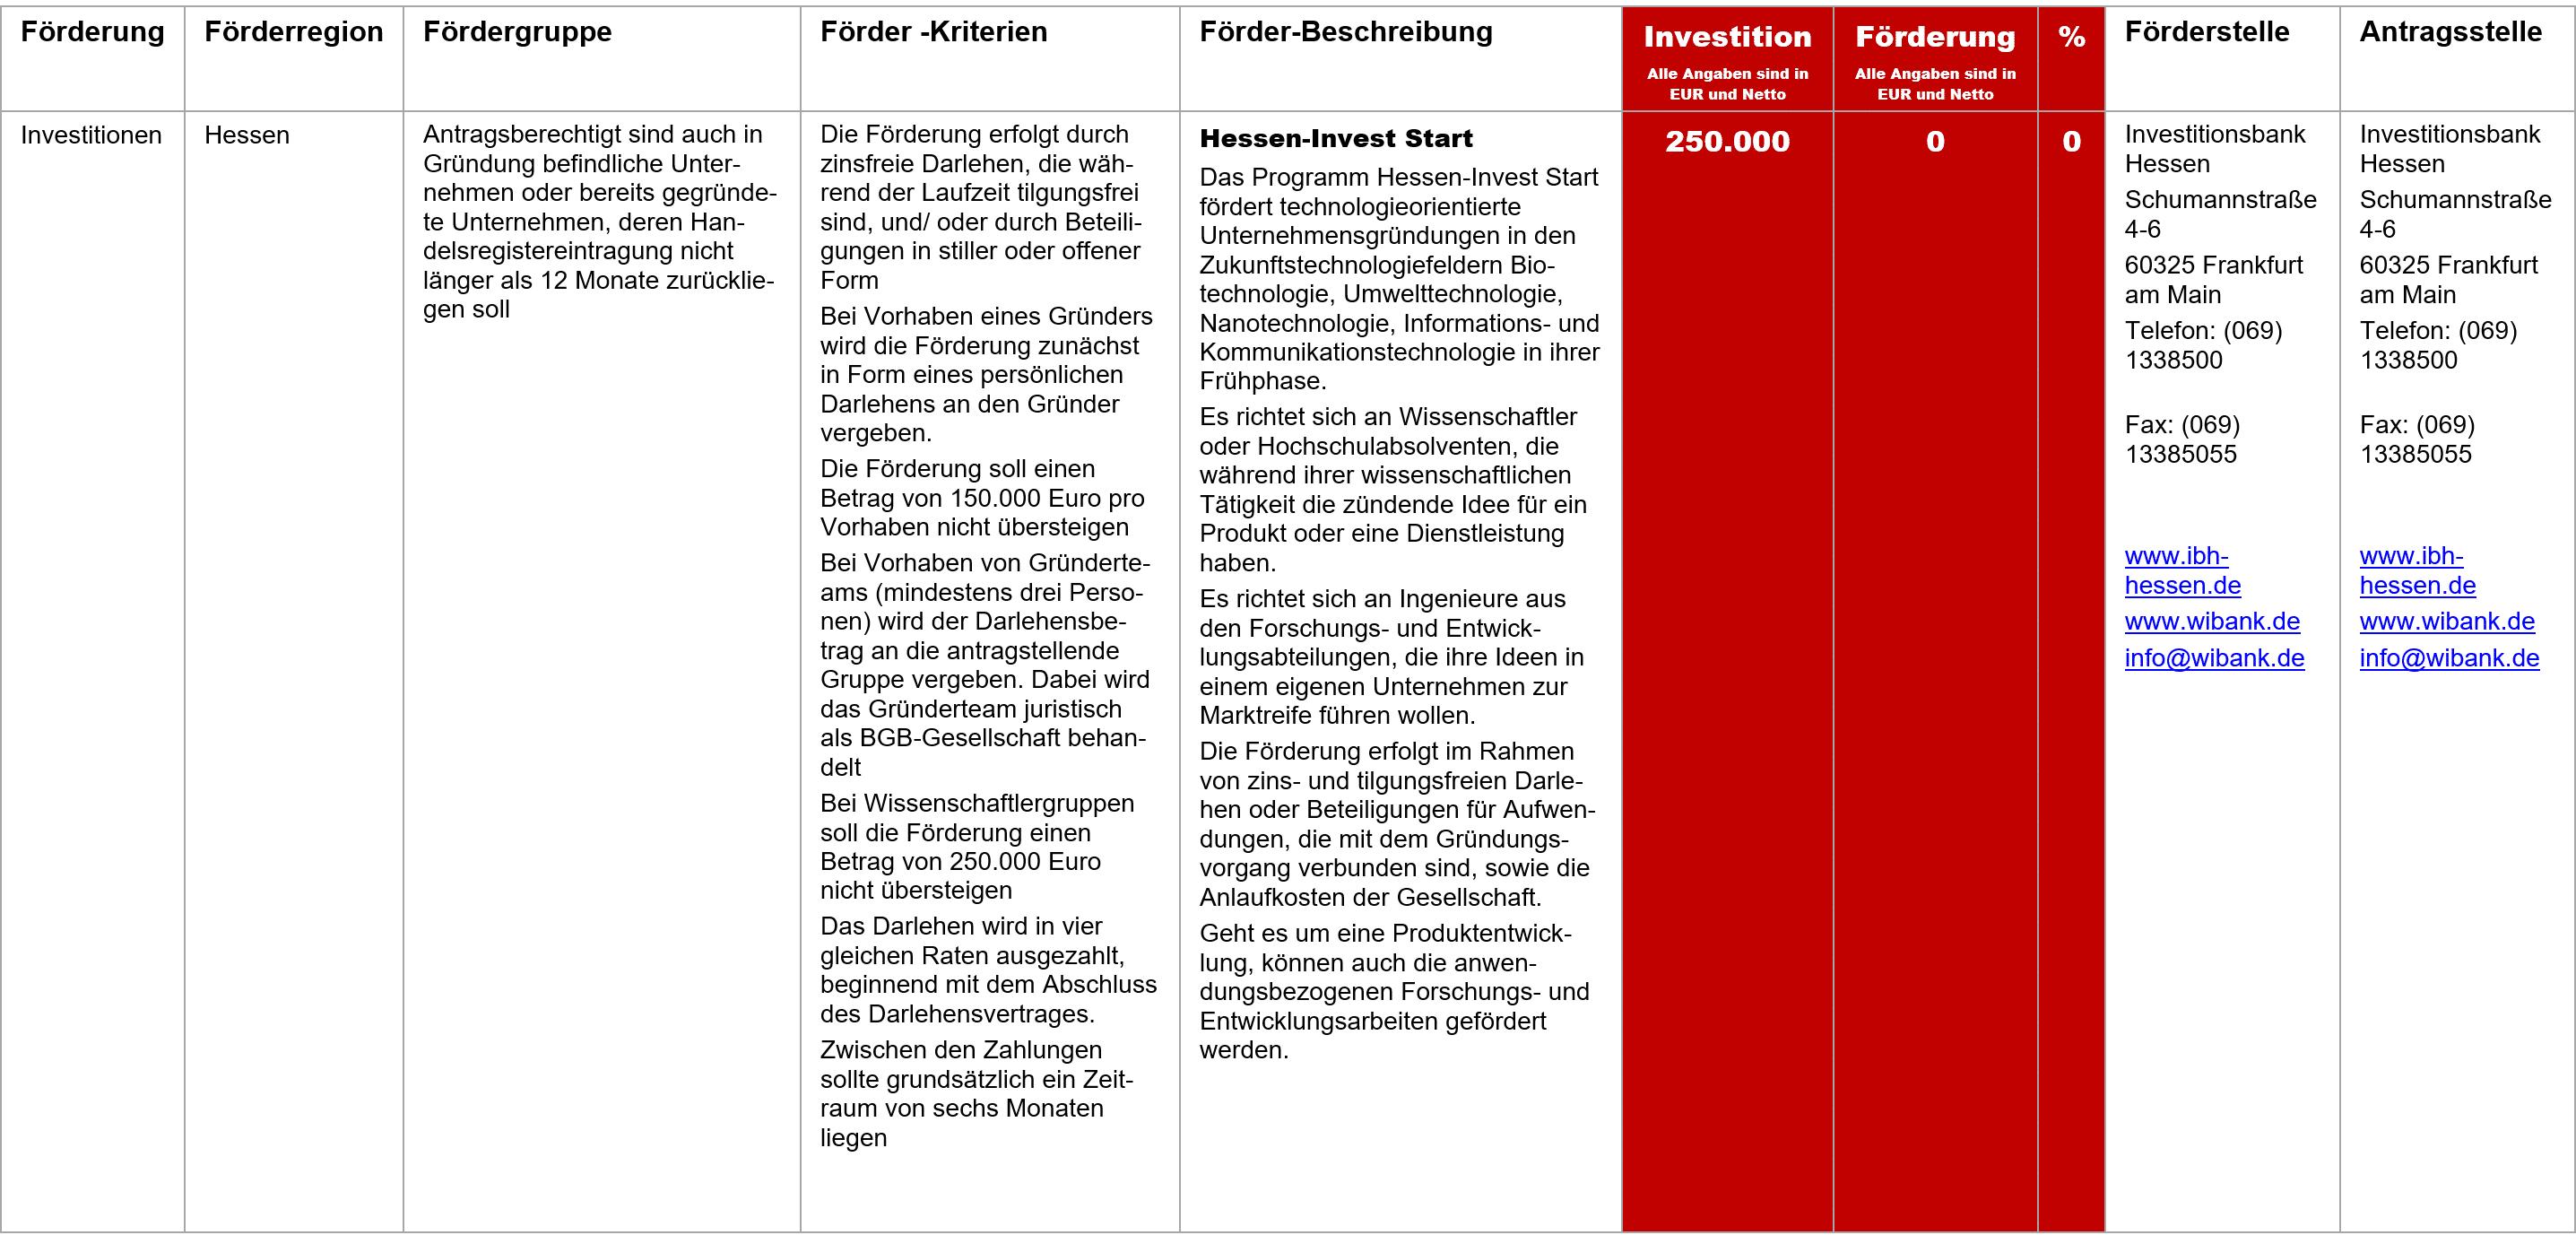 Hessen Invest Start, Fördermittel – Hessen-Invest Start